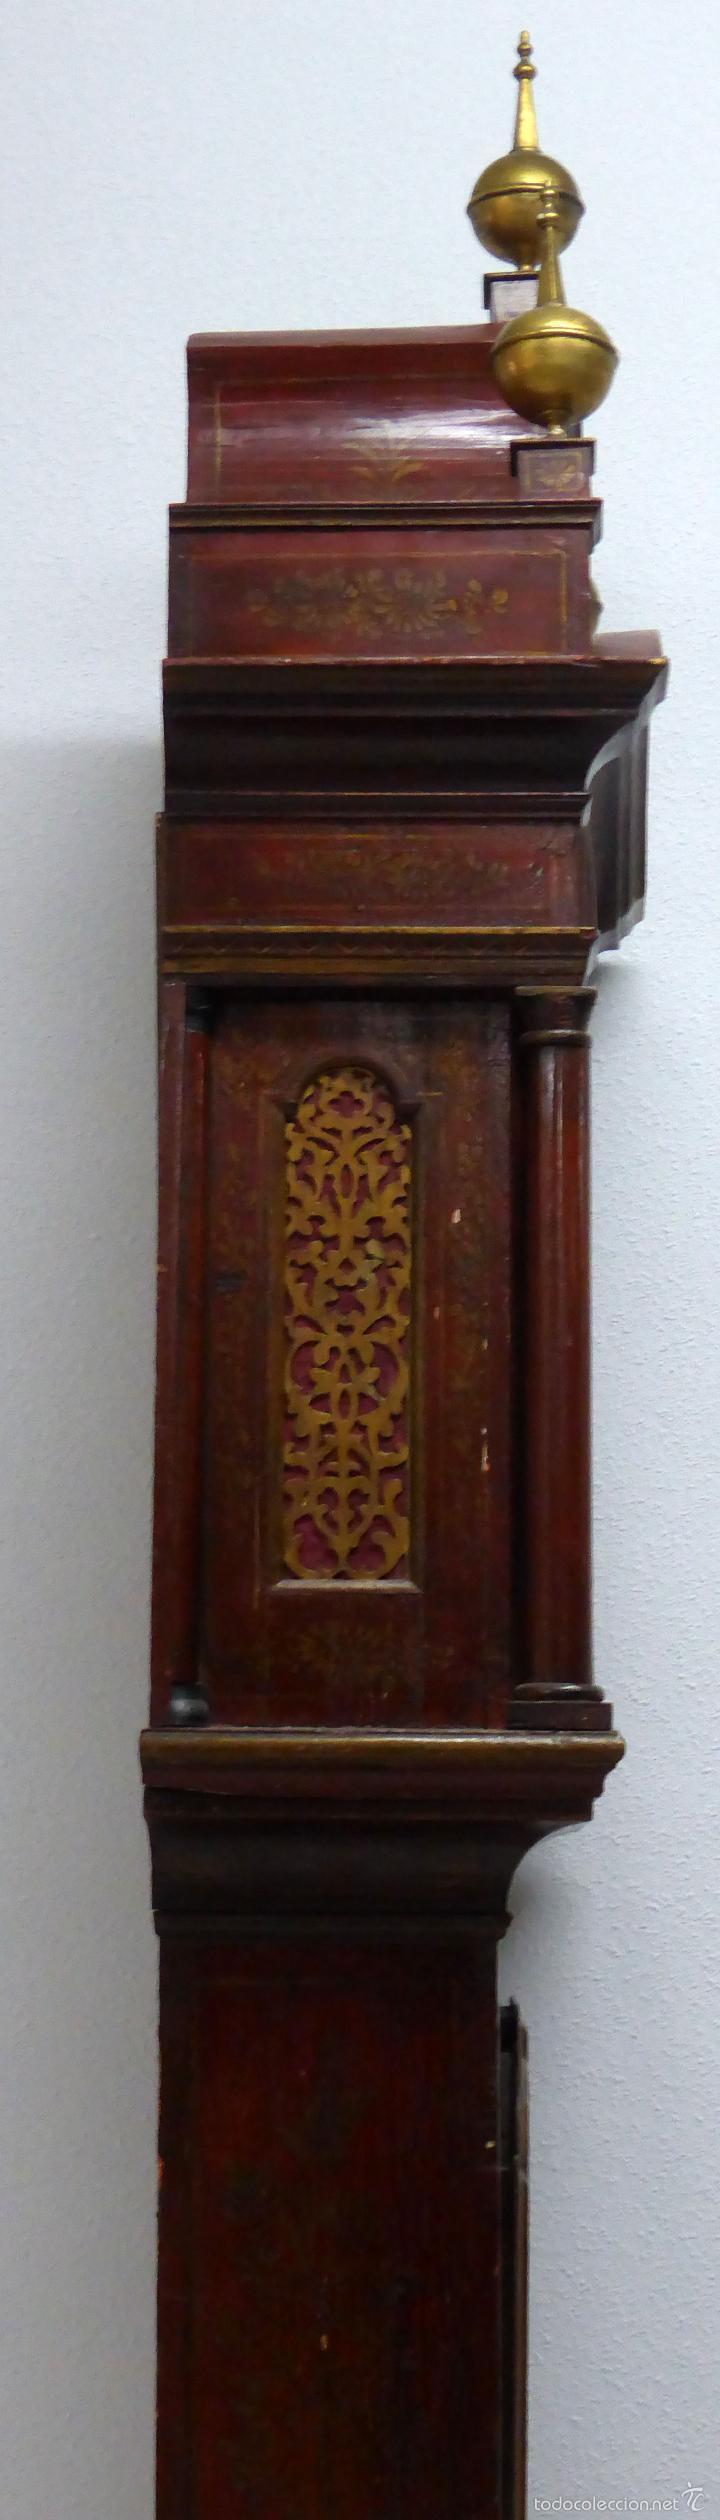 Relojes de pie: Reloj pie inglés laca japanning chinoseries S XVIII Maquinaria William Fidgett London Funciona - Foto 14 - 58294331